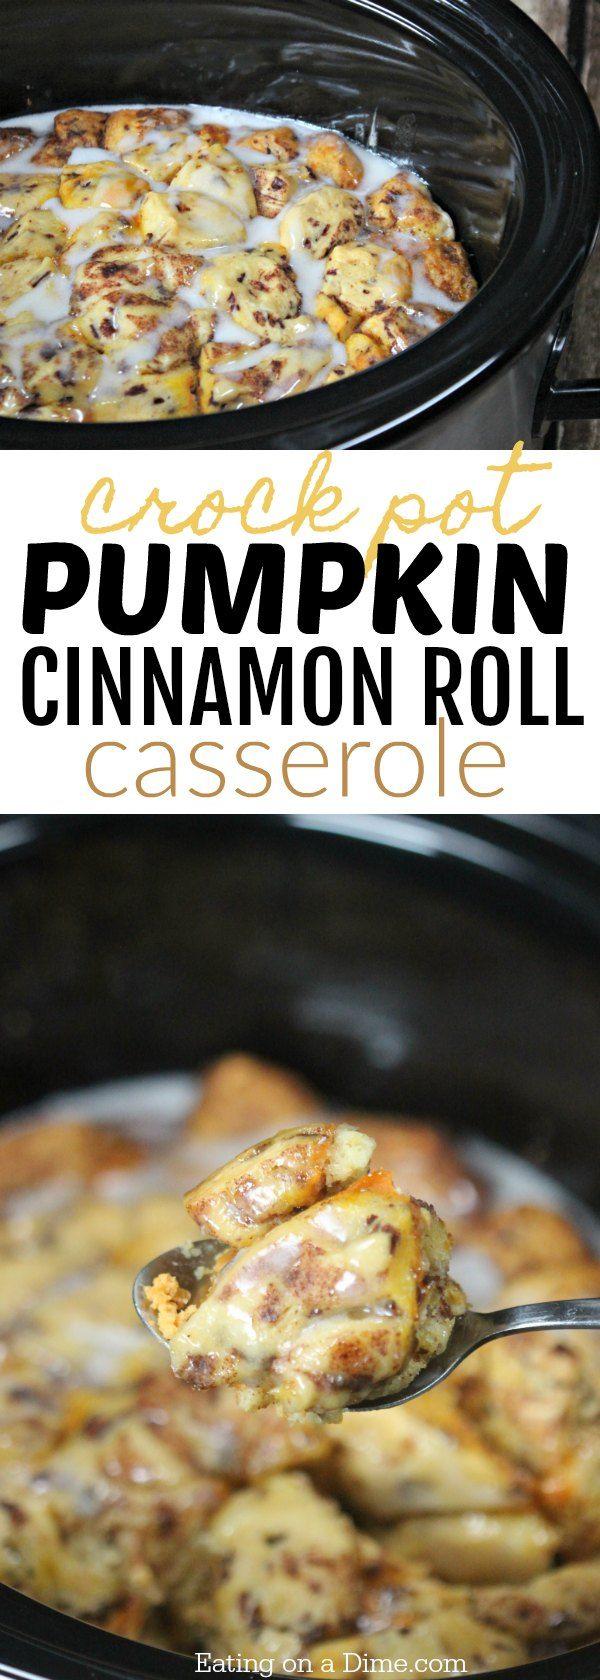 Easy Crock Pot Pumpkin Cinnamon Roll Casserole Recipe